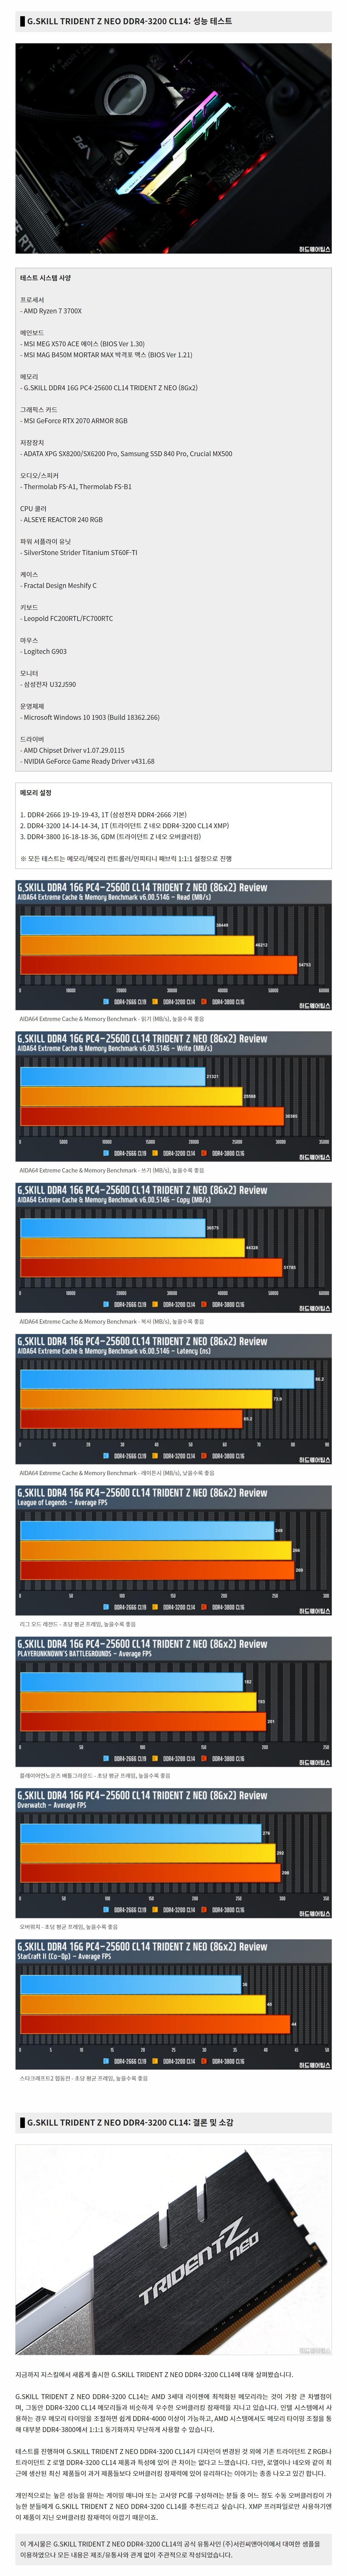 G.SKILL DDR4 16G PC4-25600 CL14 TRIDENT Z NEO (8Gx2) 리뷰 6.jpg